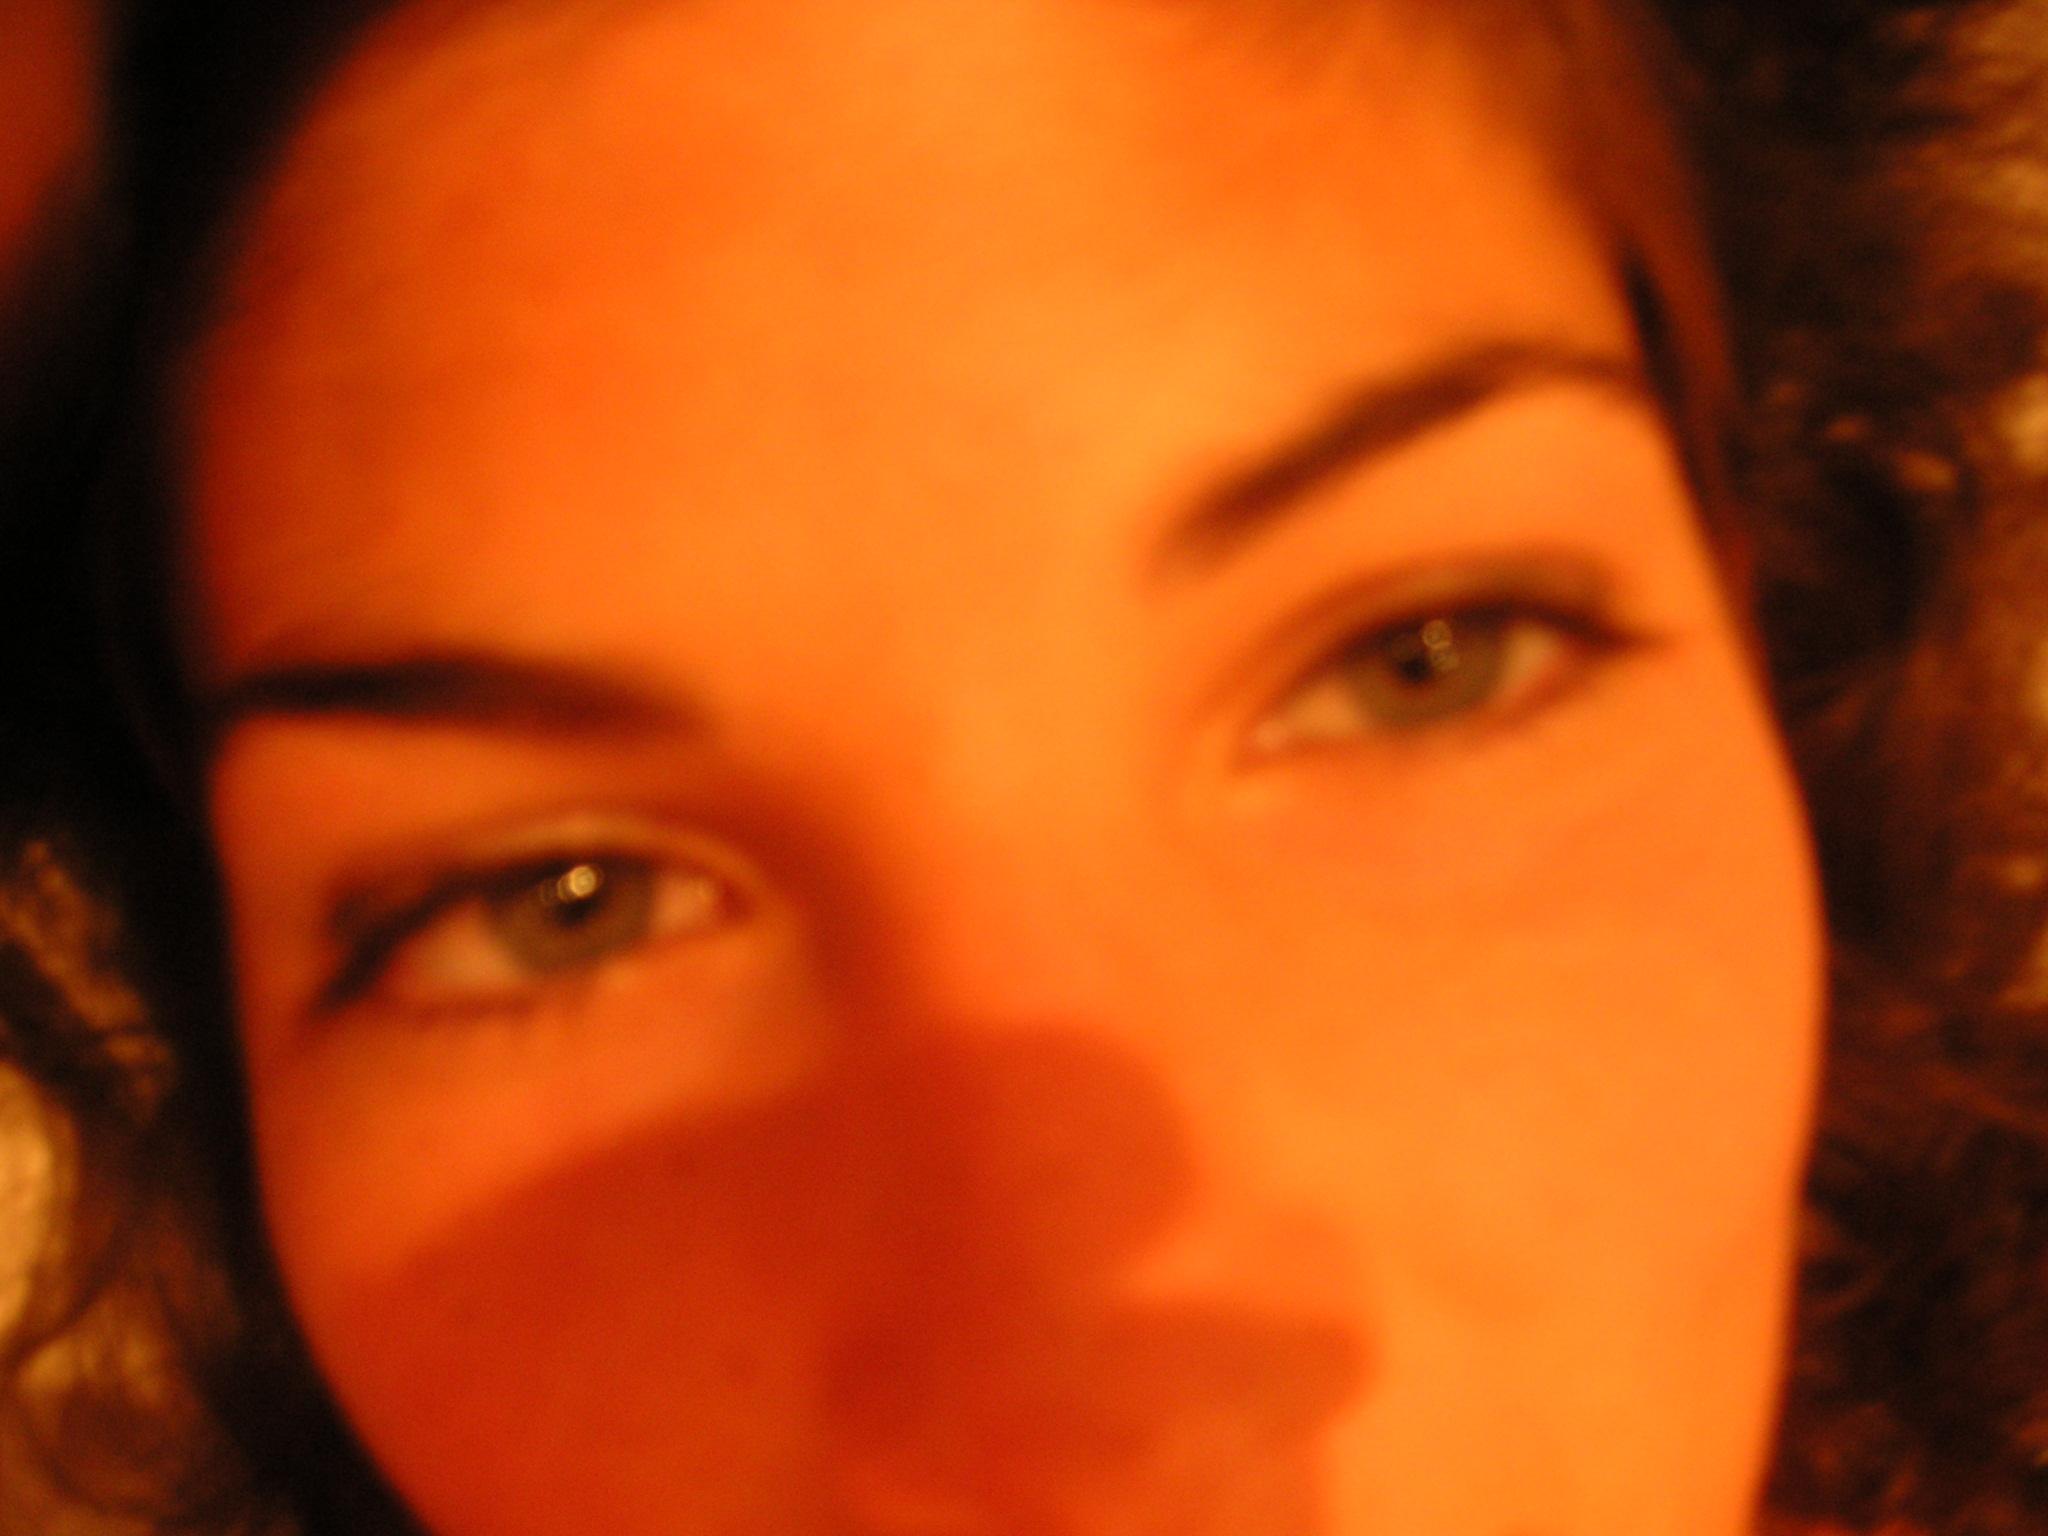 Index of /audio/Ariel/Pers/Digital Camera/Jaclyn/Bed